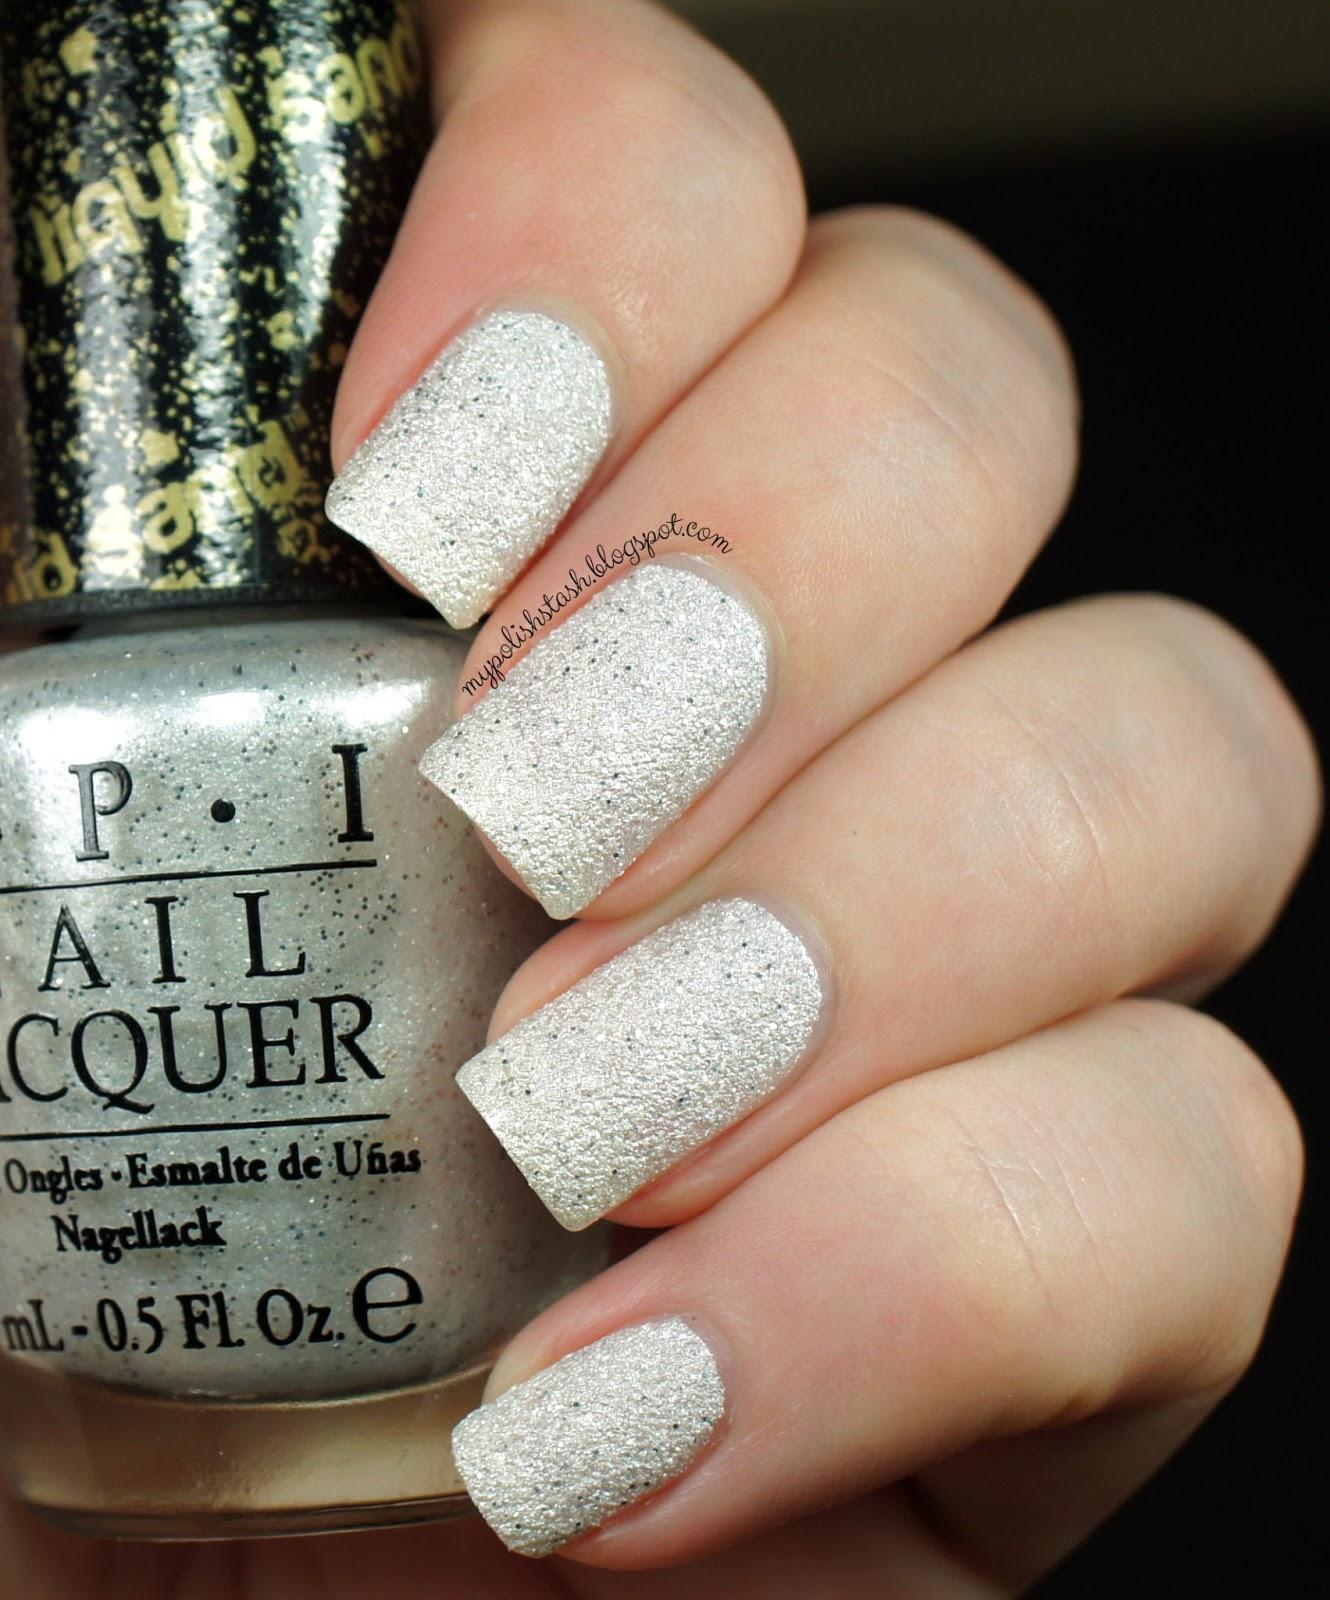 my polish stash: opi bond girl liquid sand nail polish - solitaire